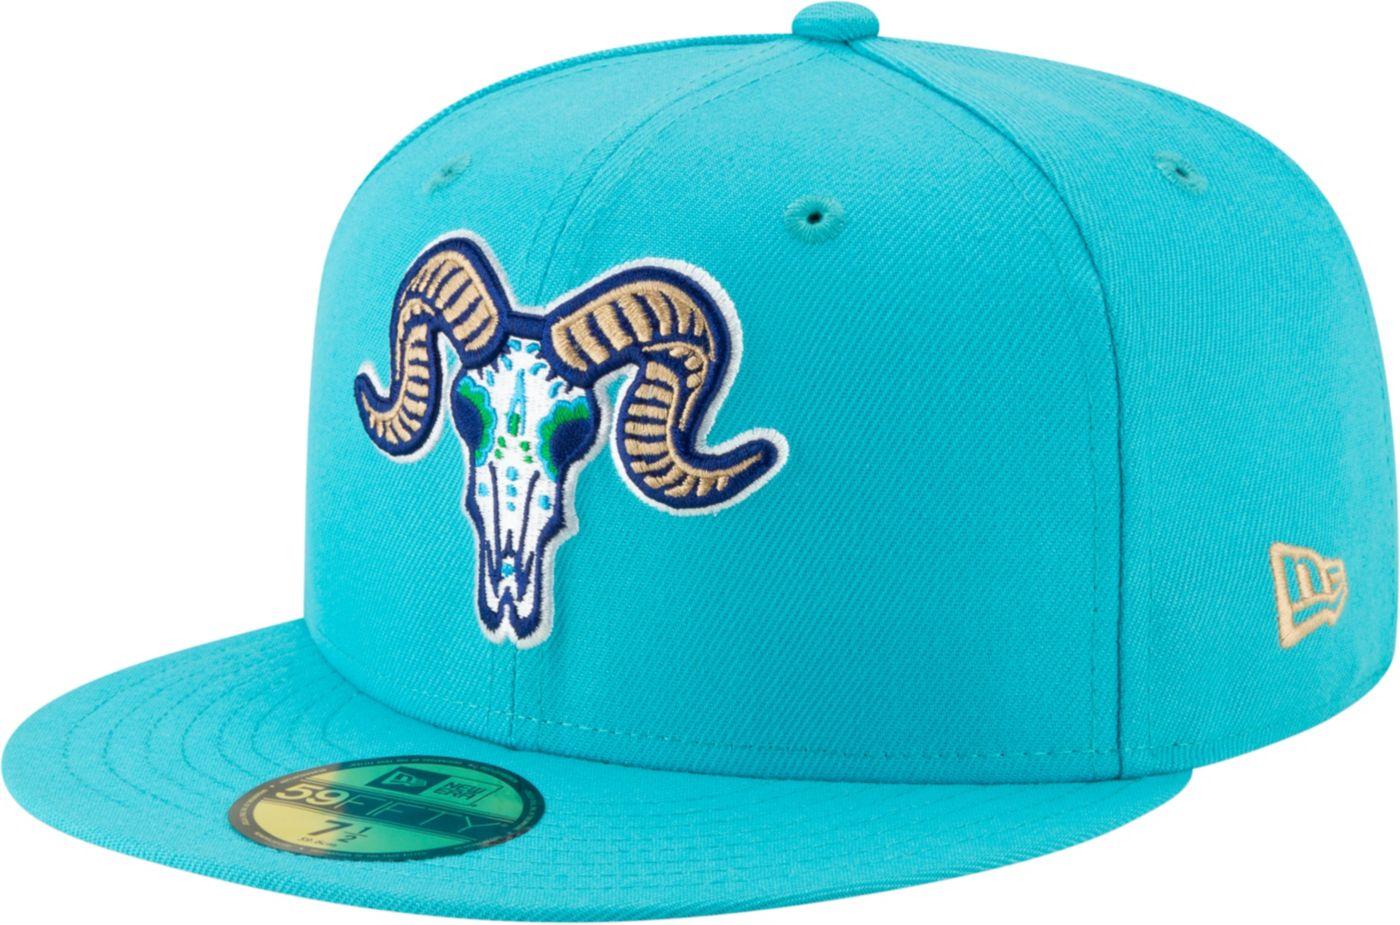 New Era Men's Hartford Yard Goats 59Fifty 2019 COPA Authentic Hat